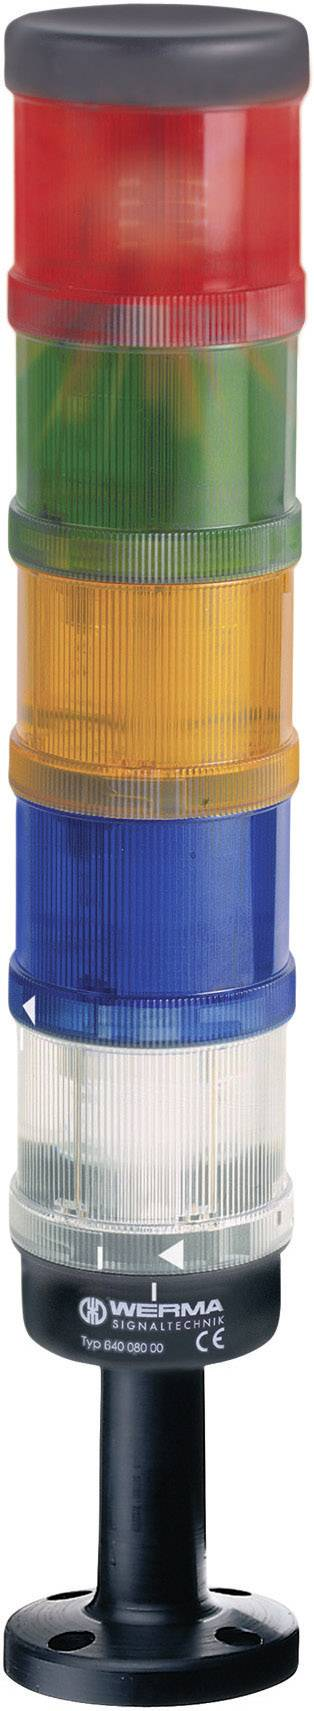 LED stálá signálka Werma 644.100.75, 24 V, IP65, červená